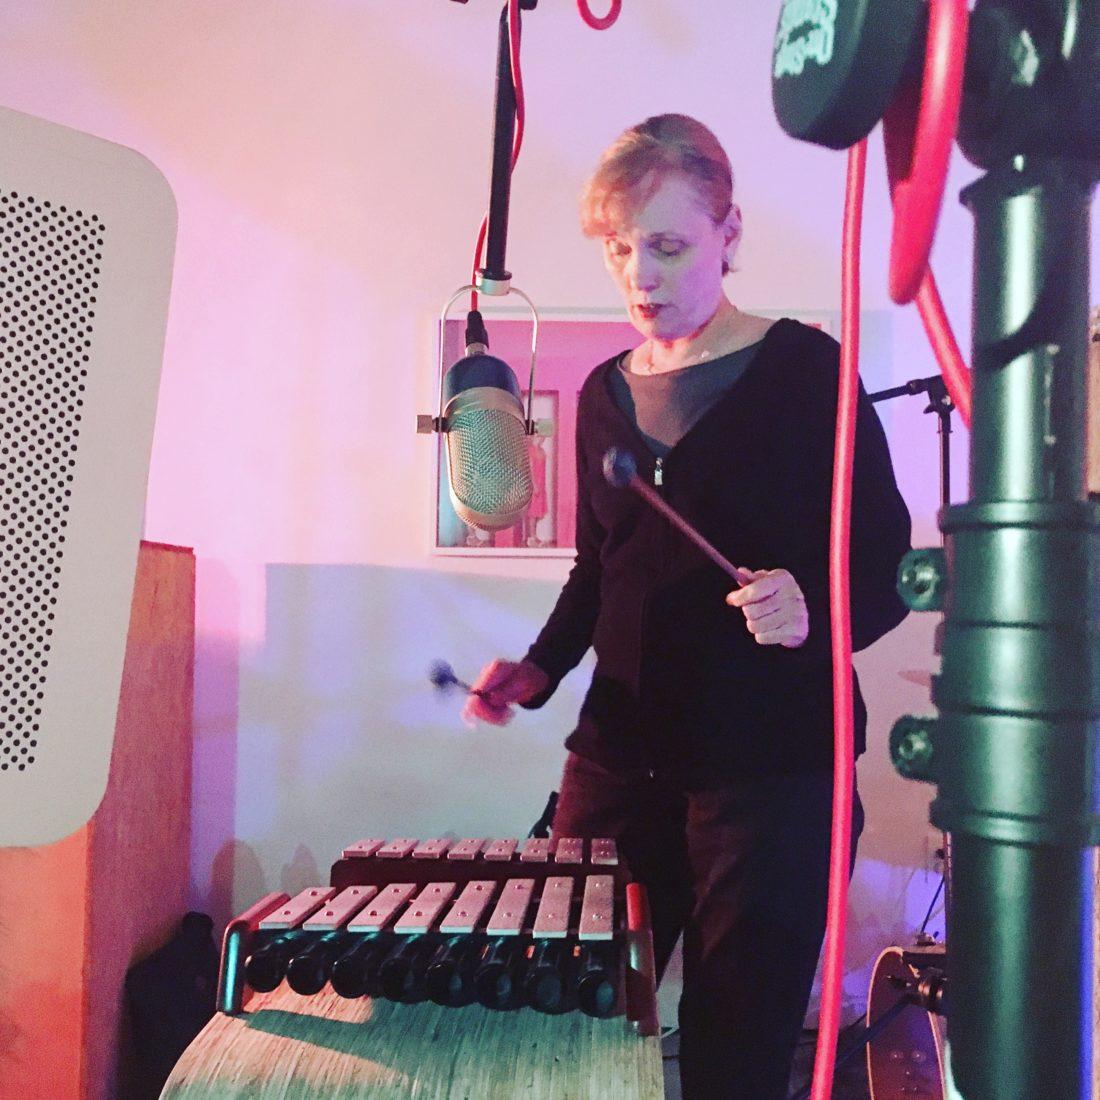 Margaret McInroe on the xylaphone